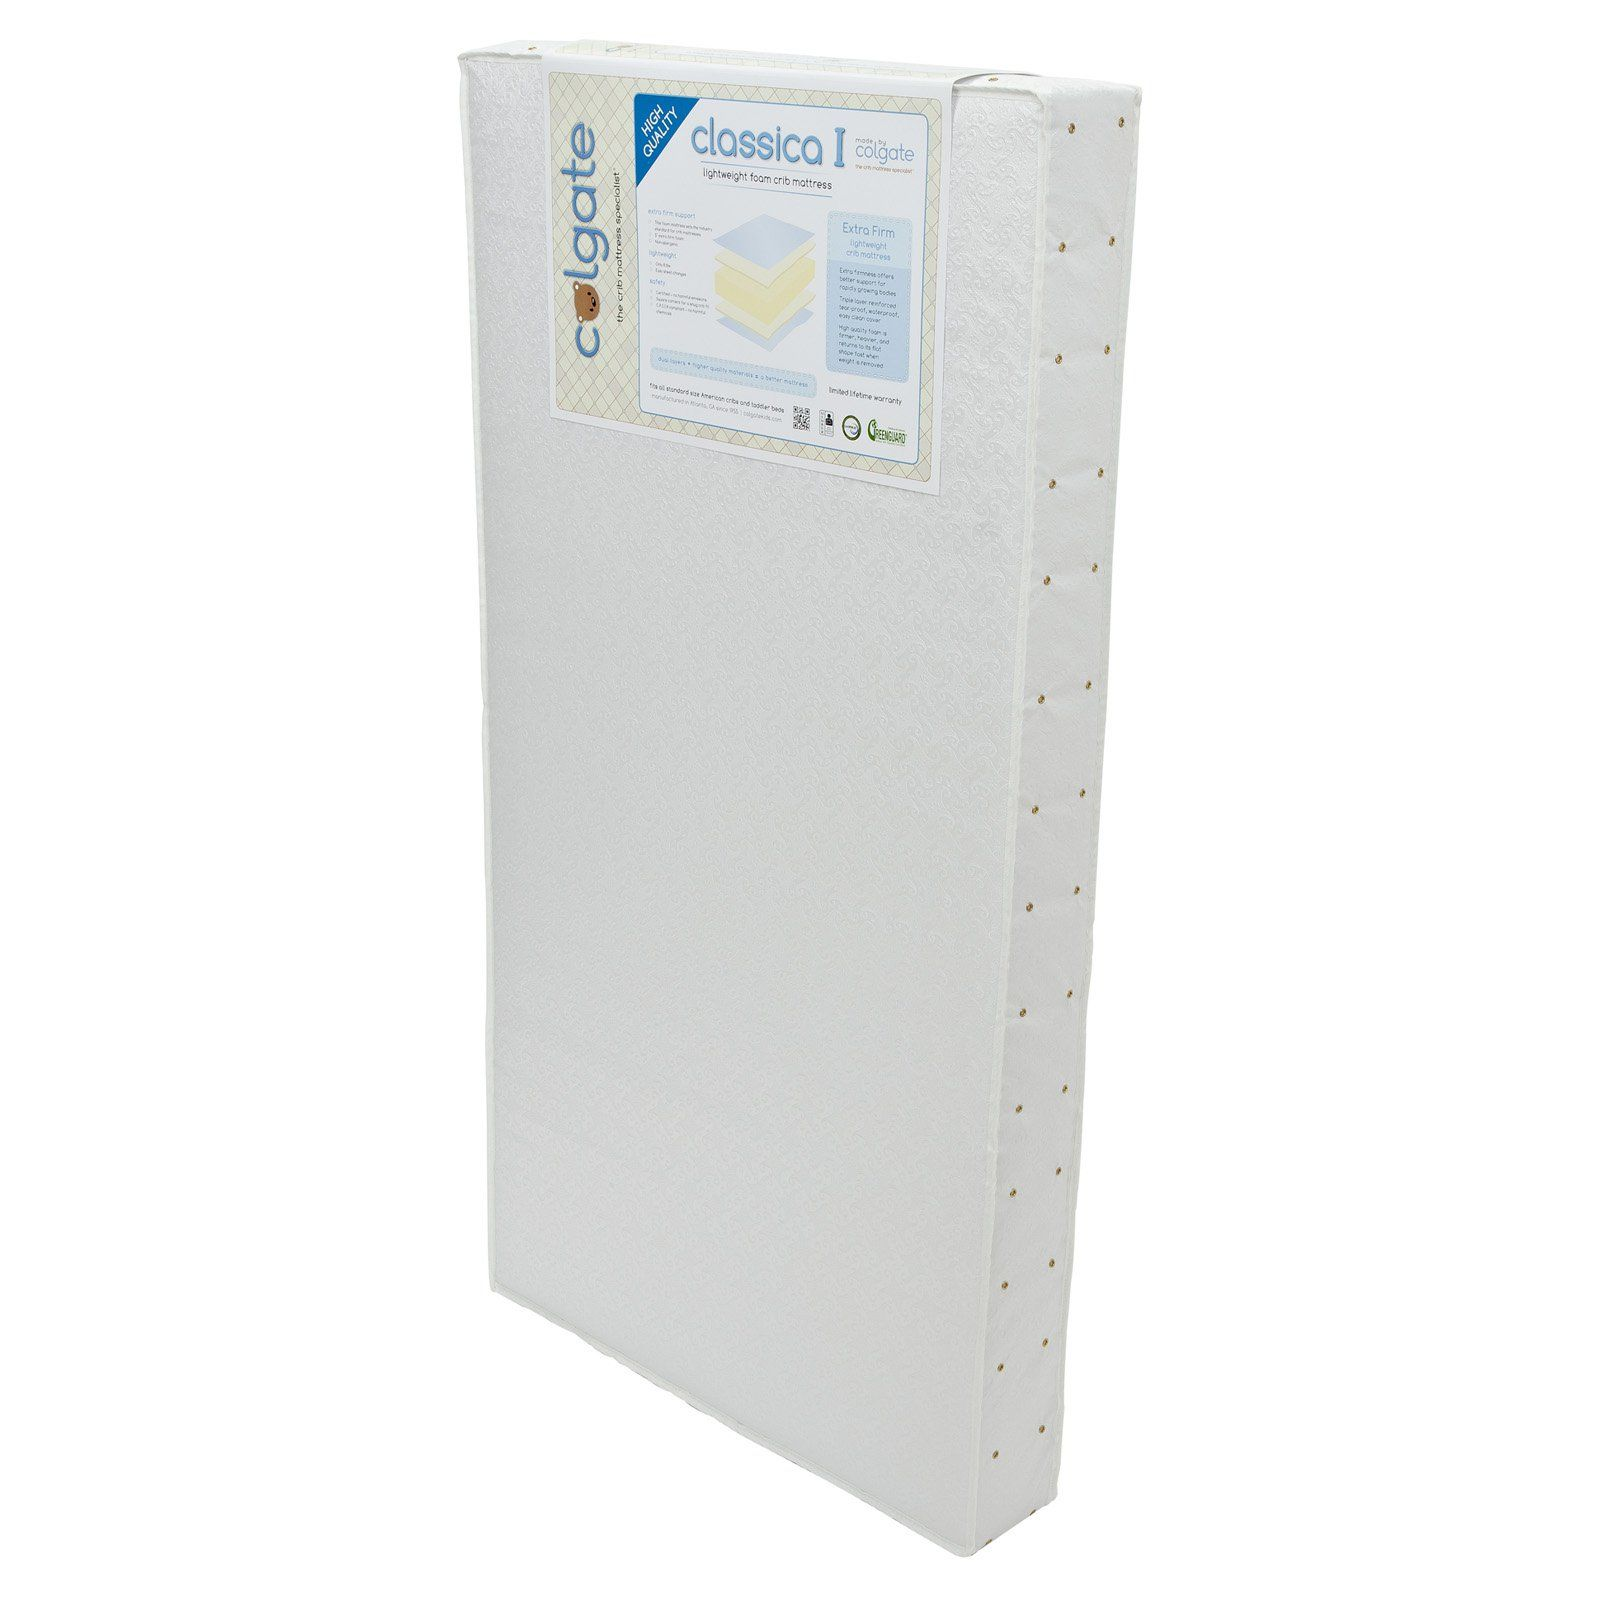 colgate classica i foam crib mattress hc515 237f products